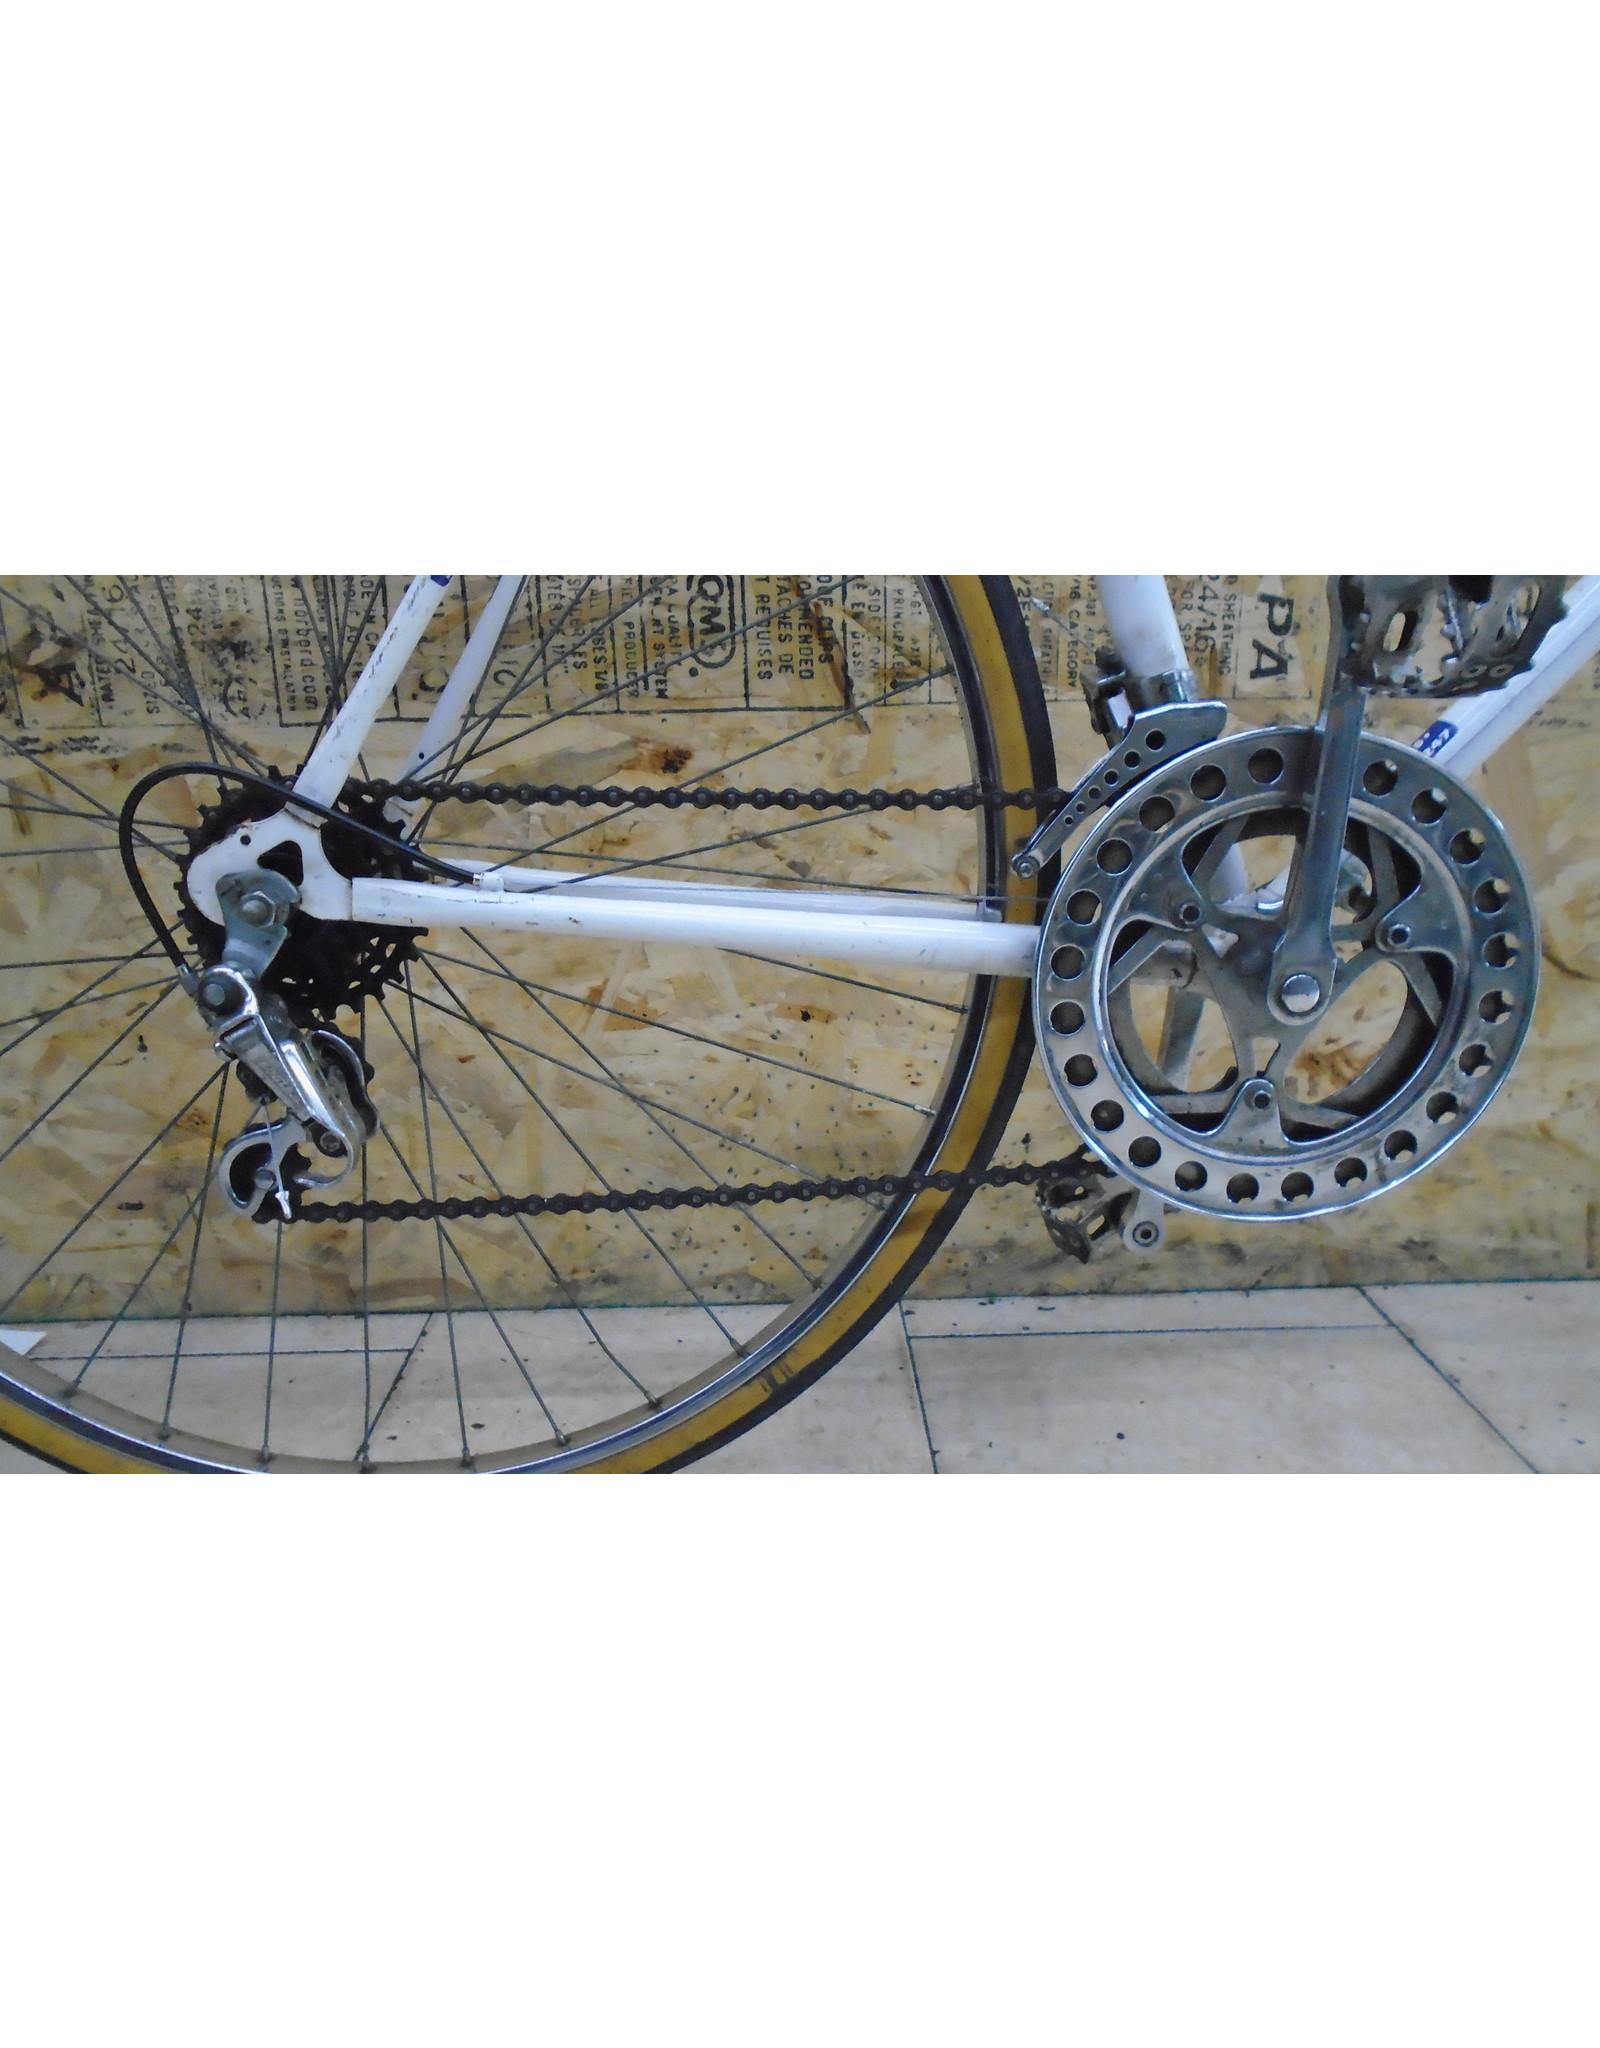 "Used Cyclo Sport 21 ""road bike - 10212"